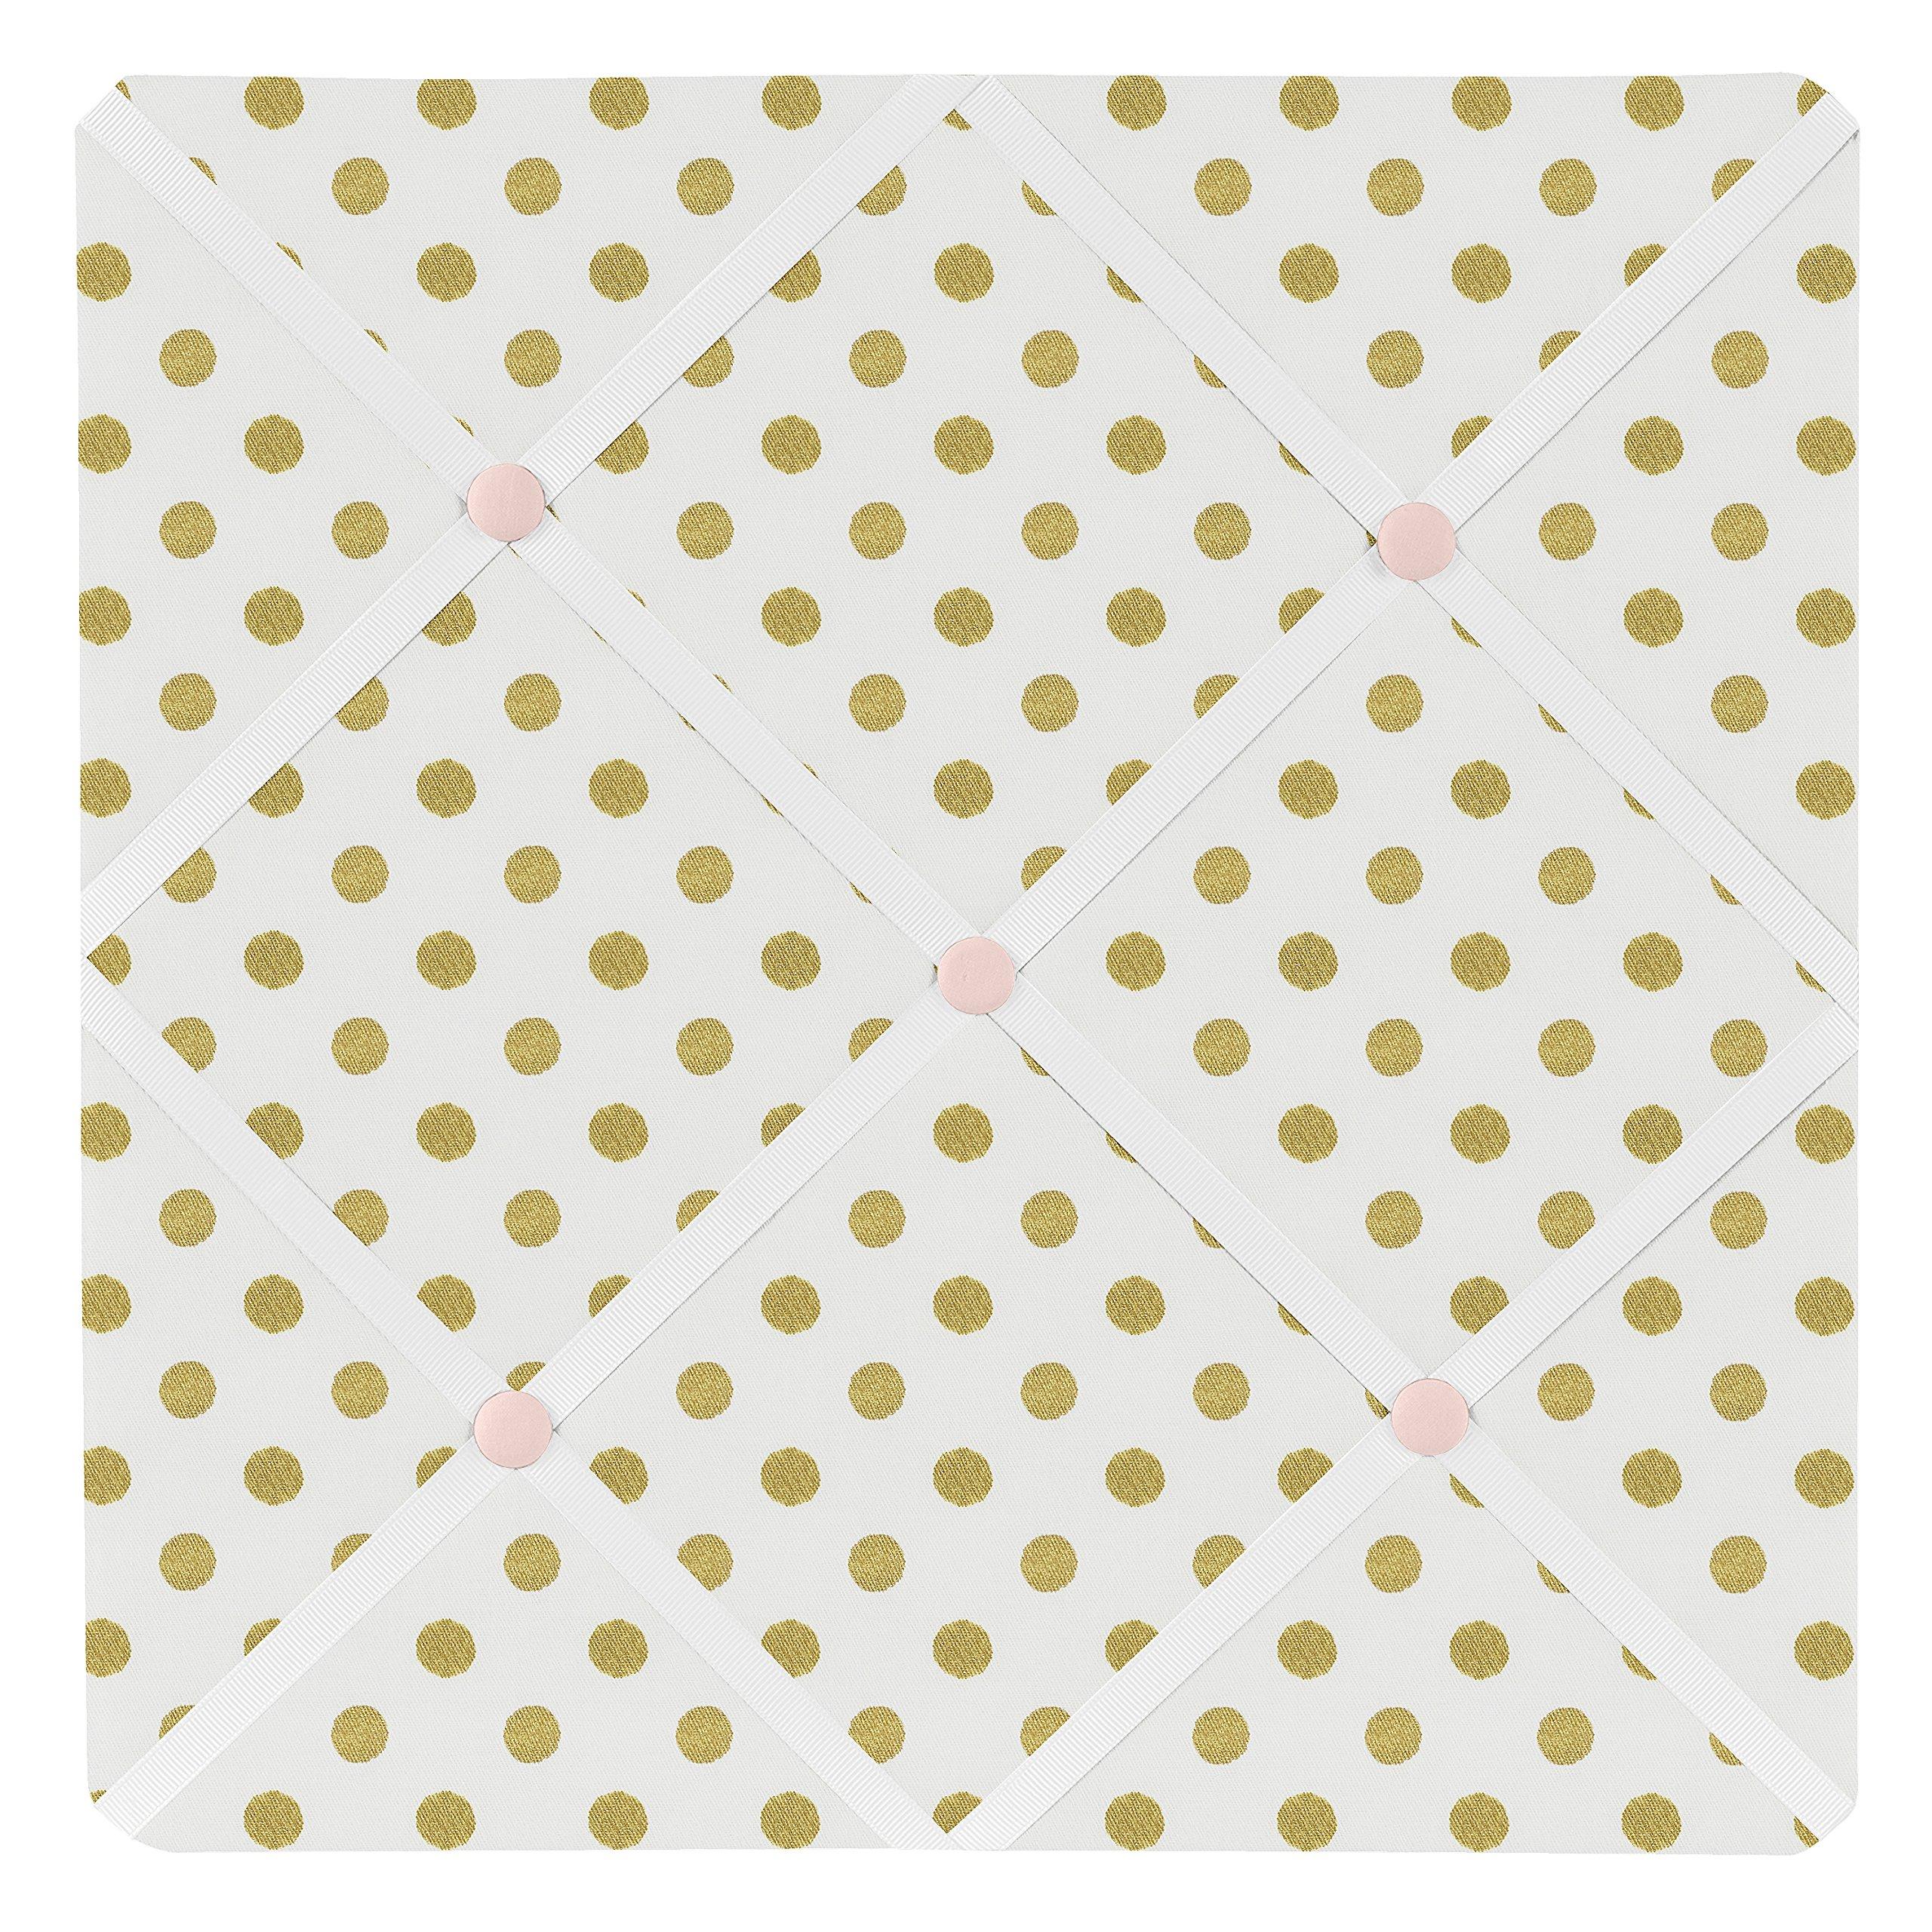 Sweet Jojo Designs Fabric Memory/Memo Photo Bulletin Board for Blush Pink White Damask and Gold Polka Dot Amelia Collection